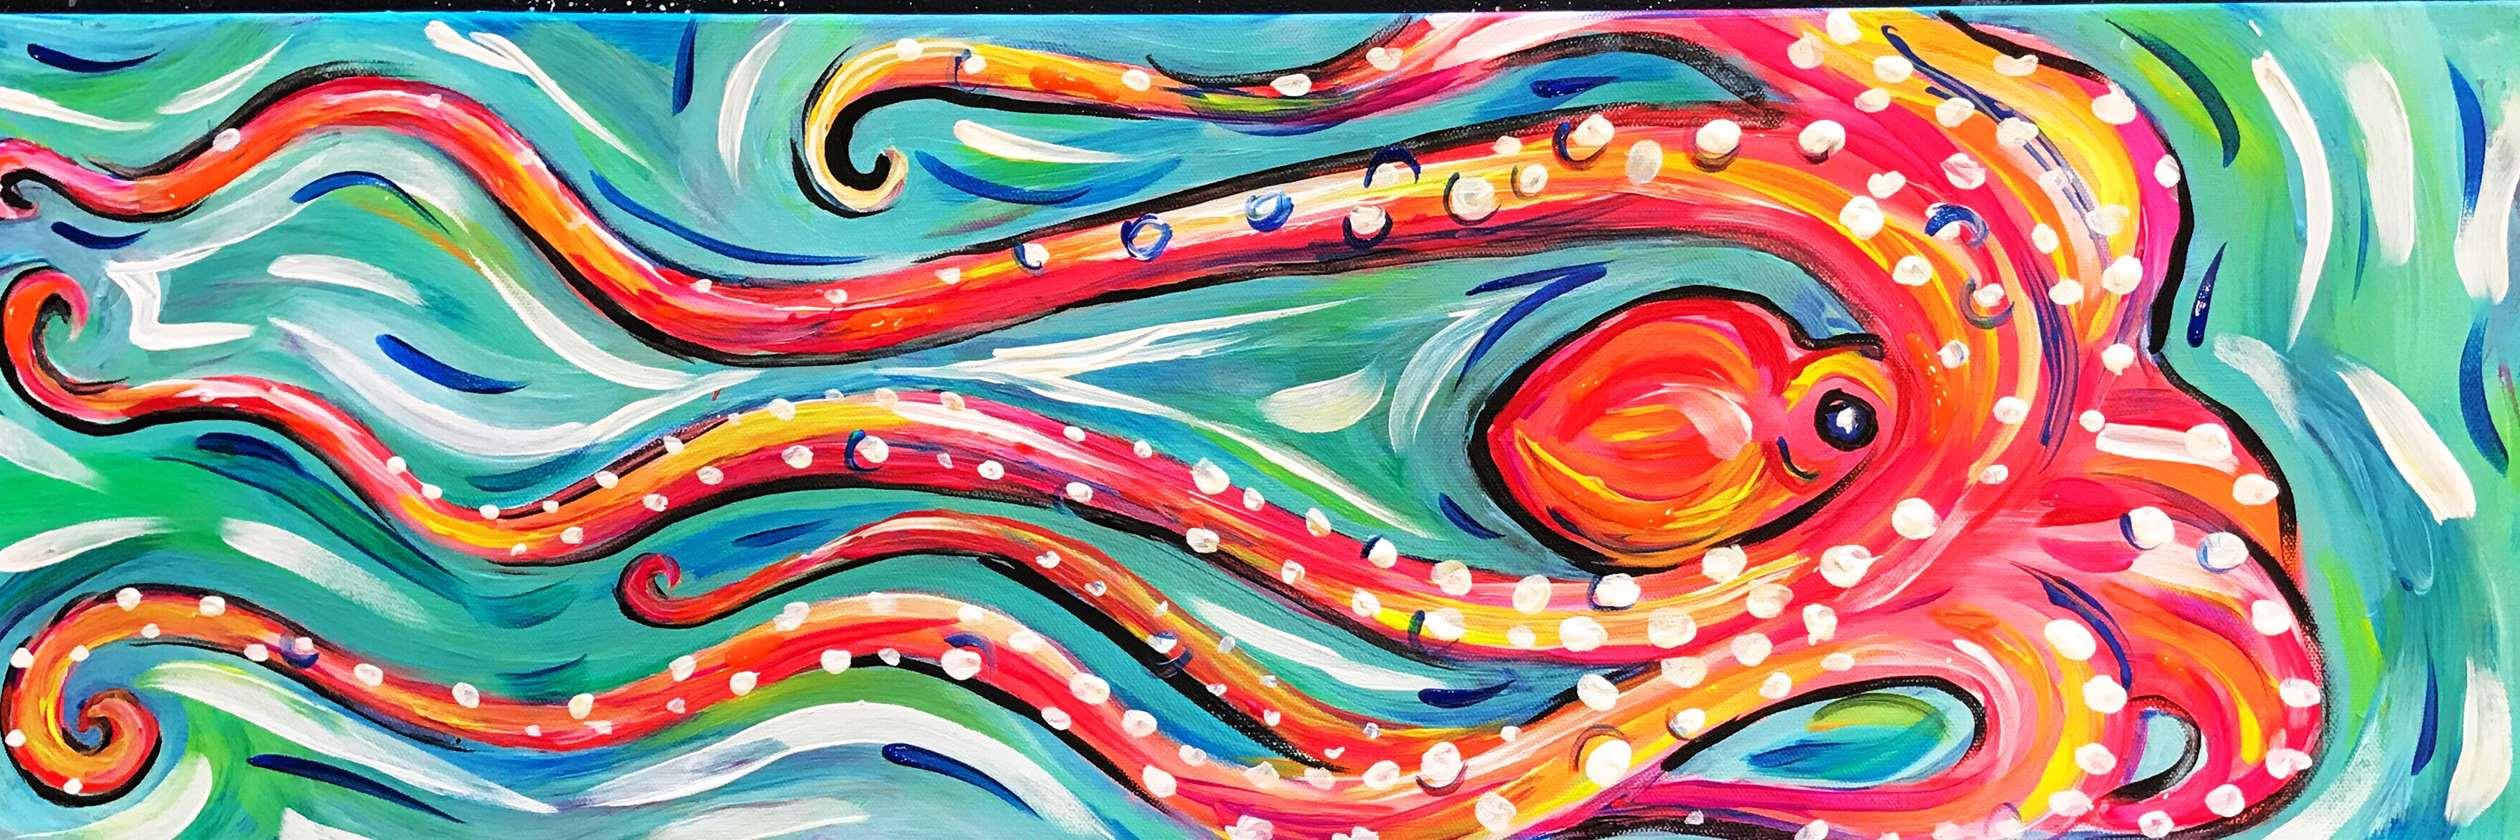 Swimming Octopus